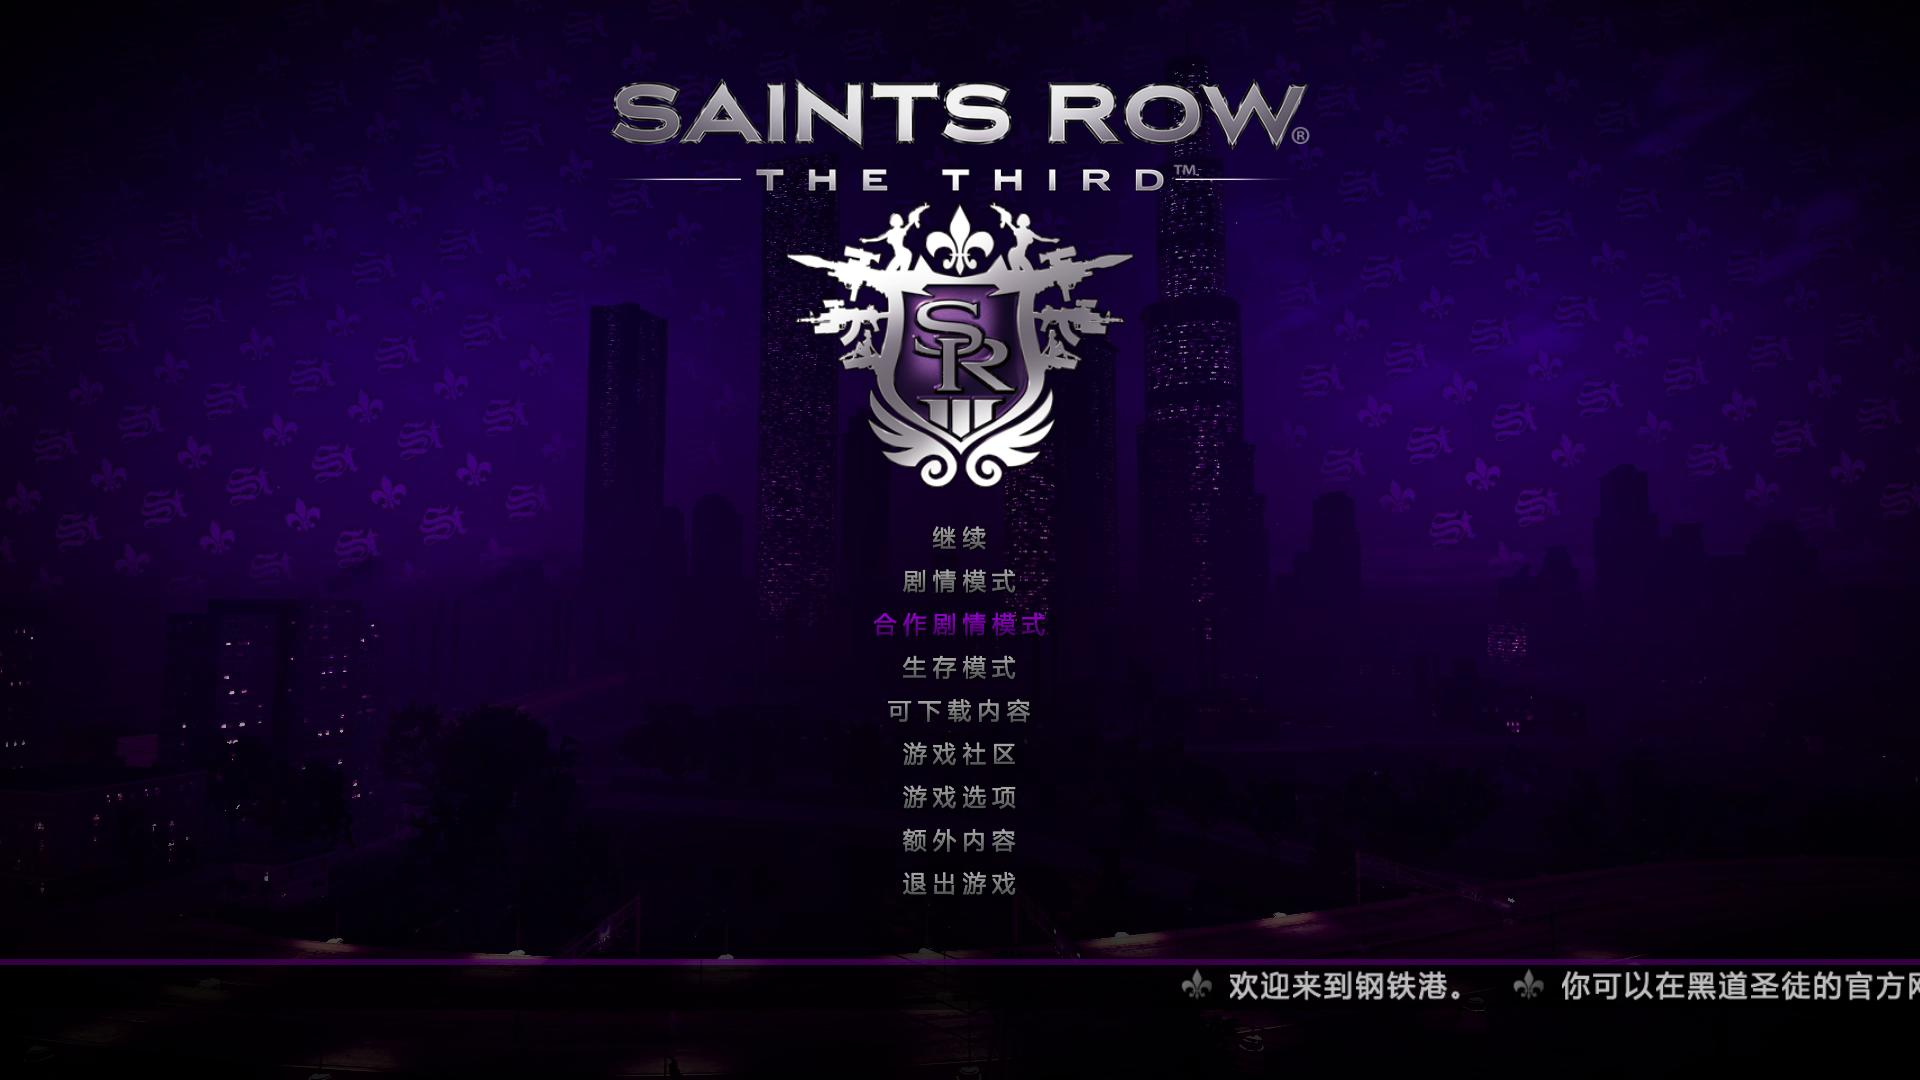 saintsrowthethird 2013-06-14 10-06-01-36.jpg